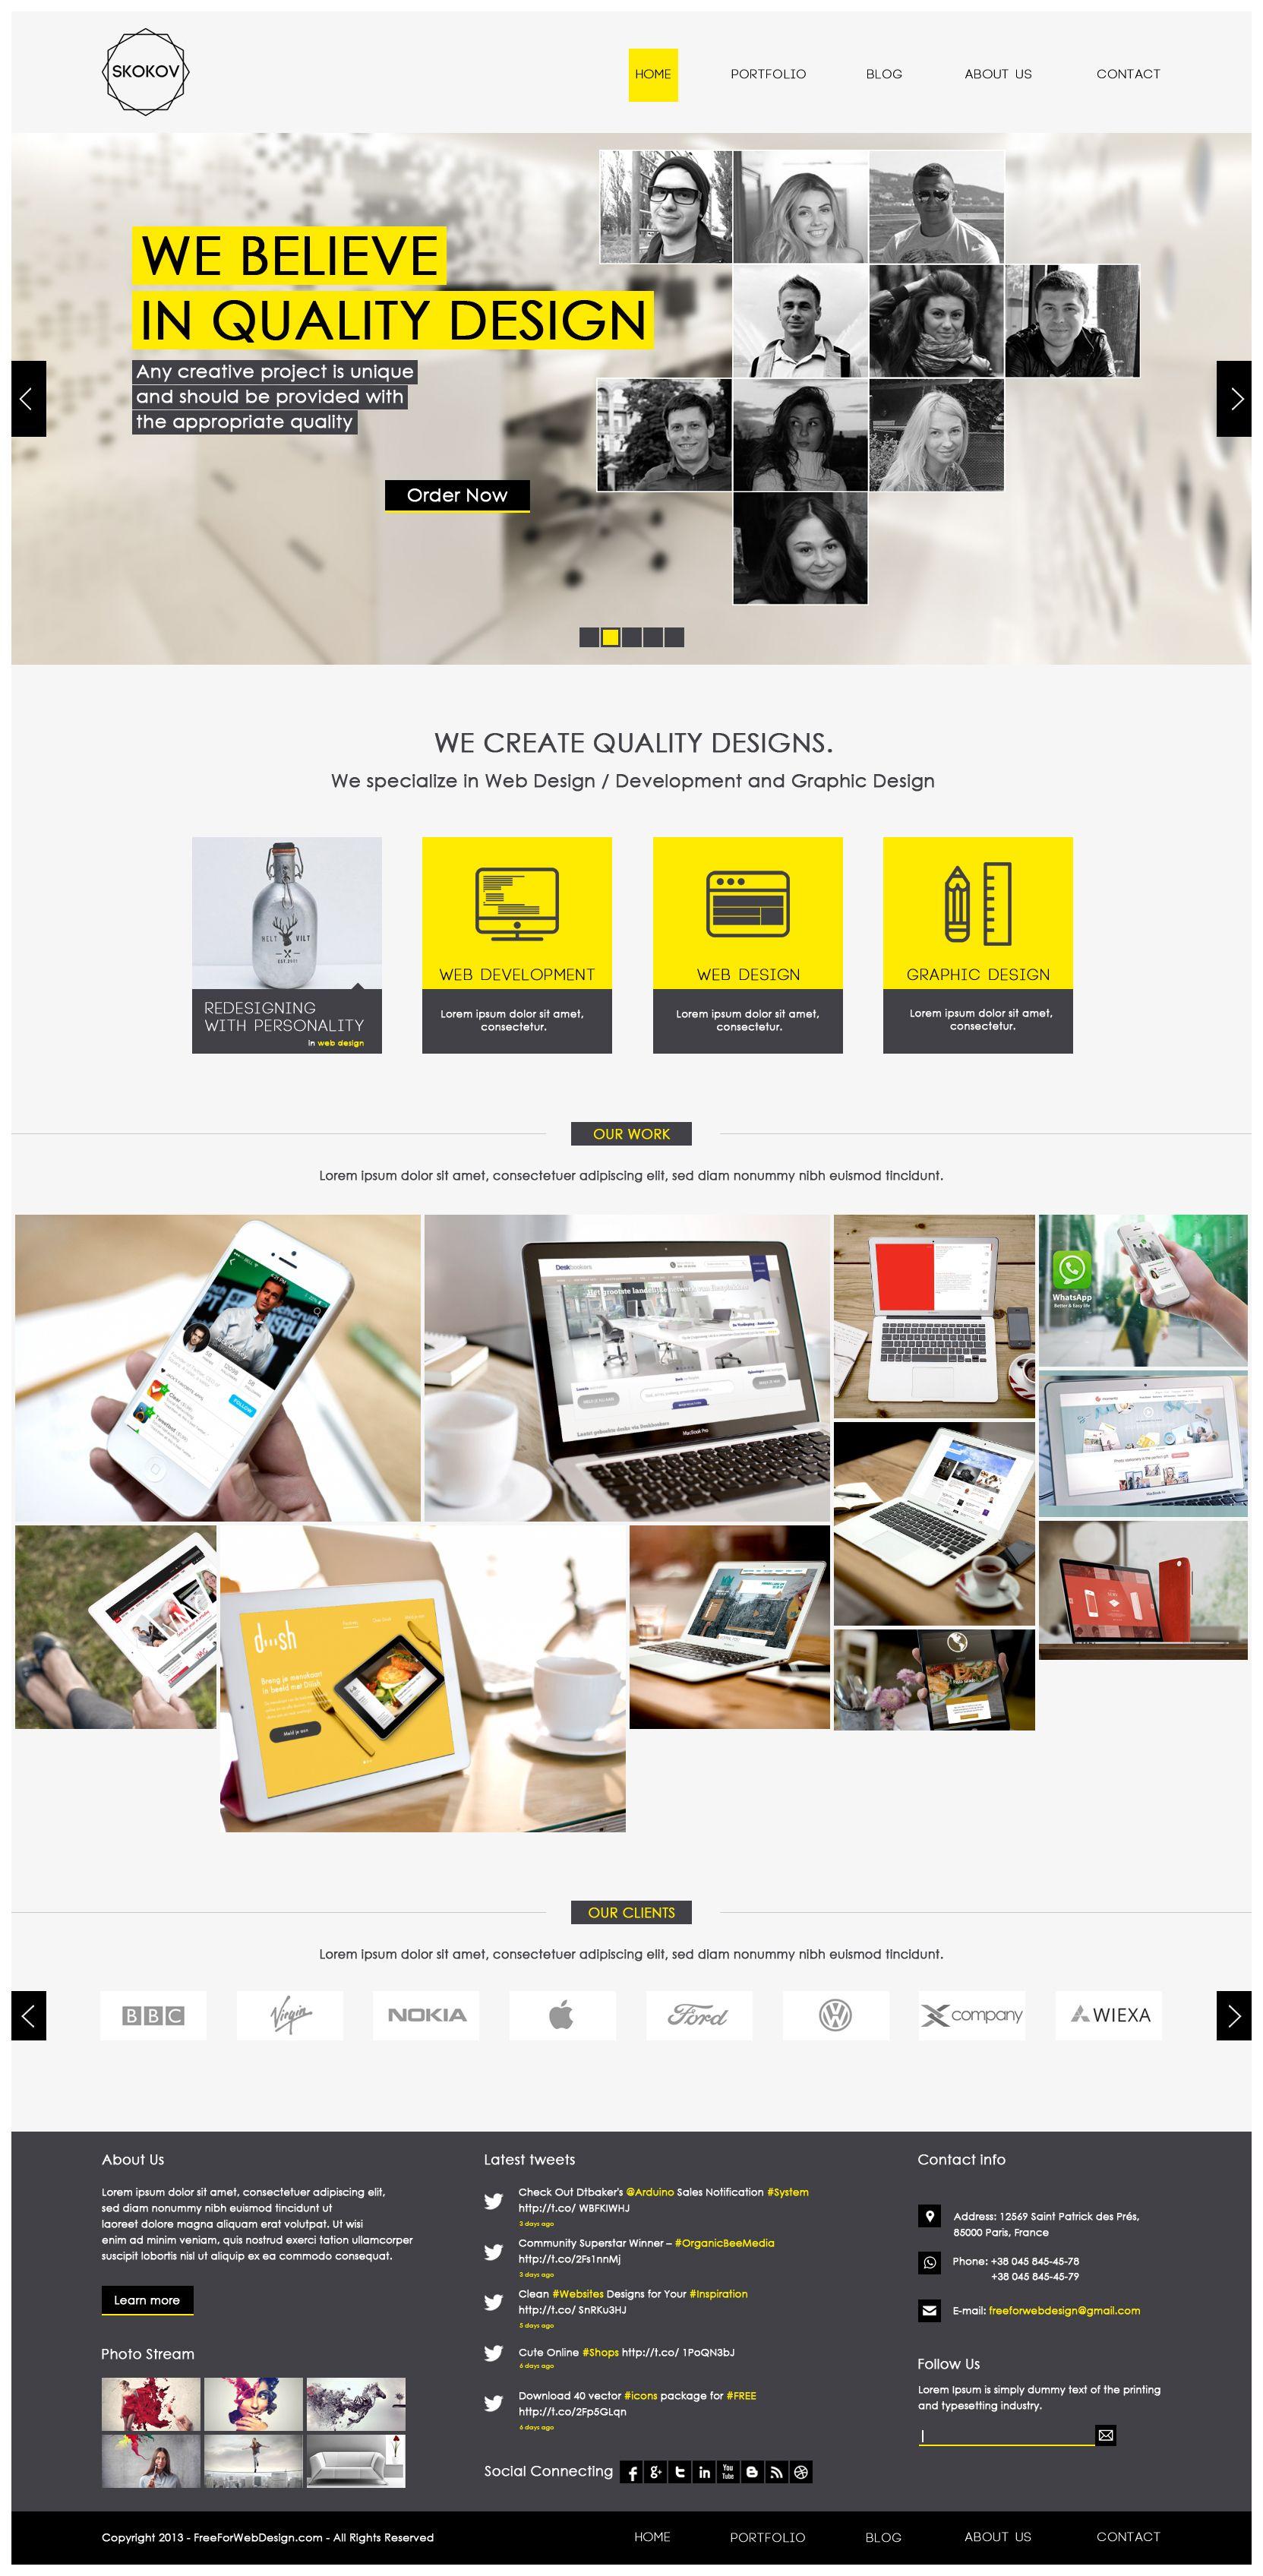 skokov free corporate web design template psd my website